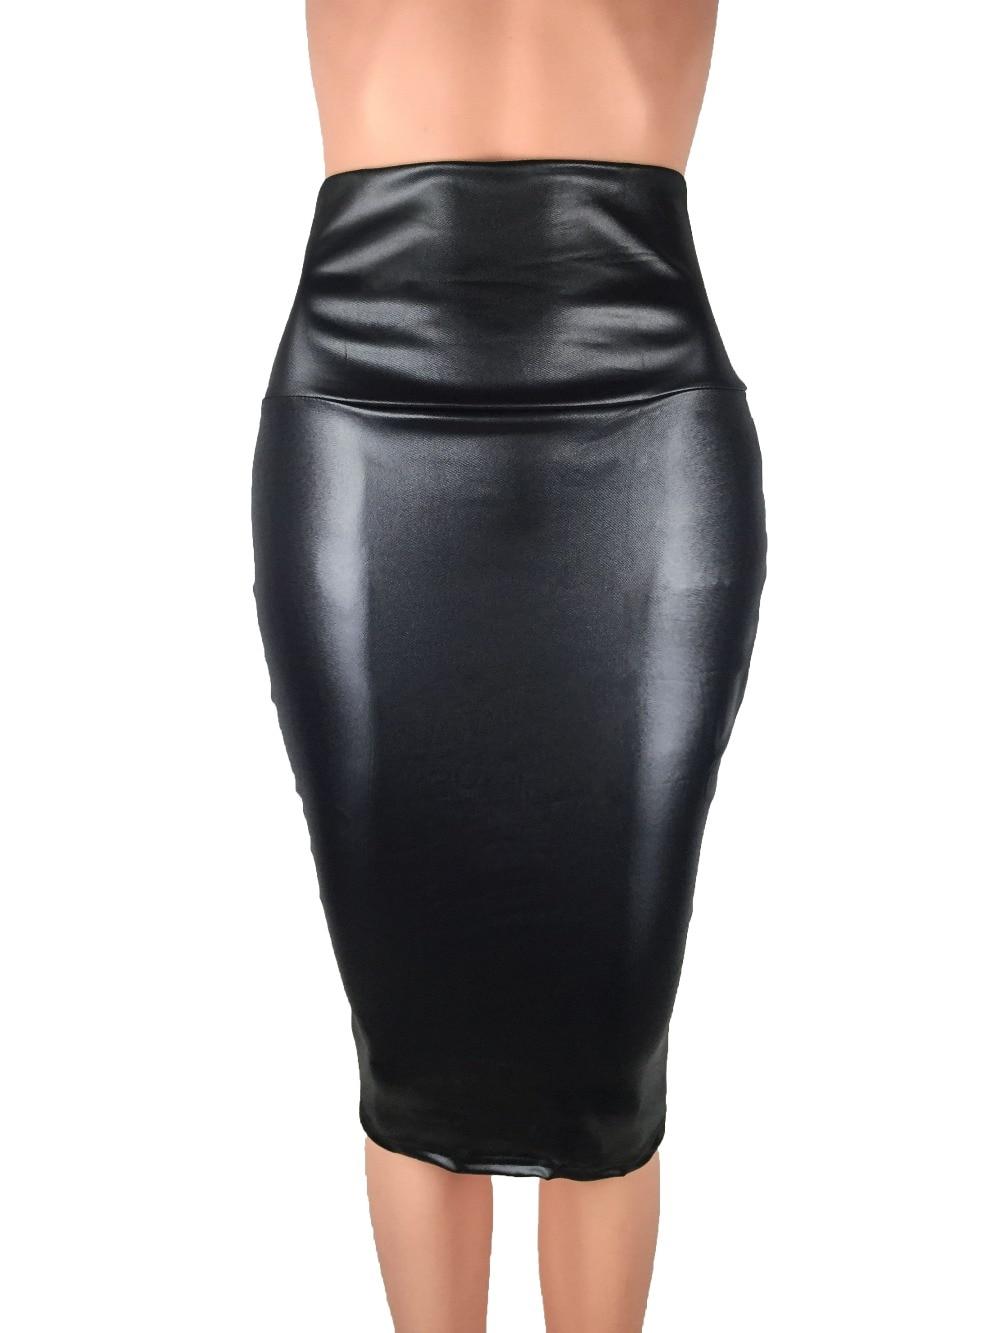 Bohocotol 2018 μολύβι faux δερμάτινη φούστα - Γυναικείος ρουχισμός - Φωτογραφία 1